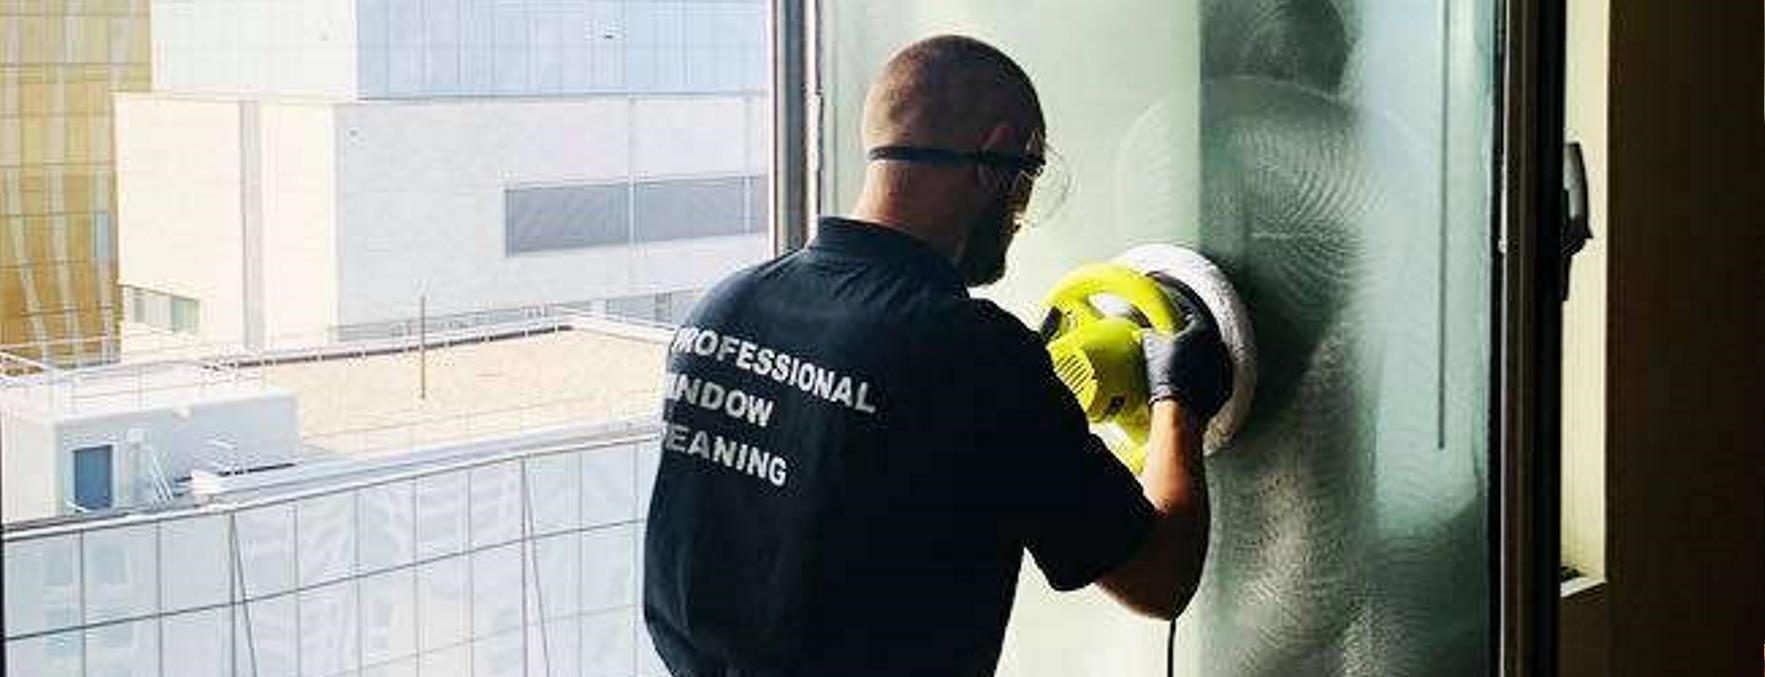 glass restoration services near me